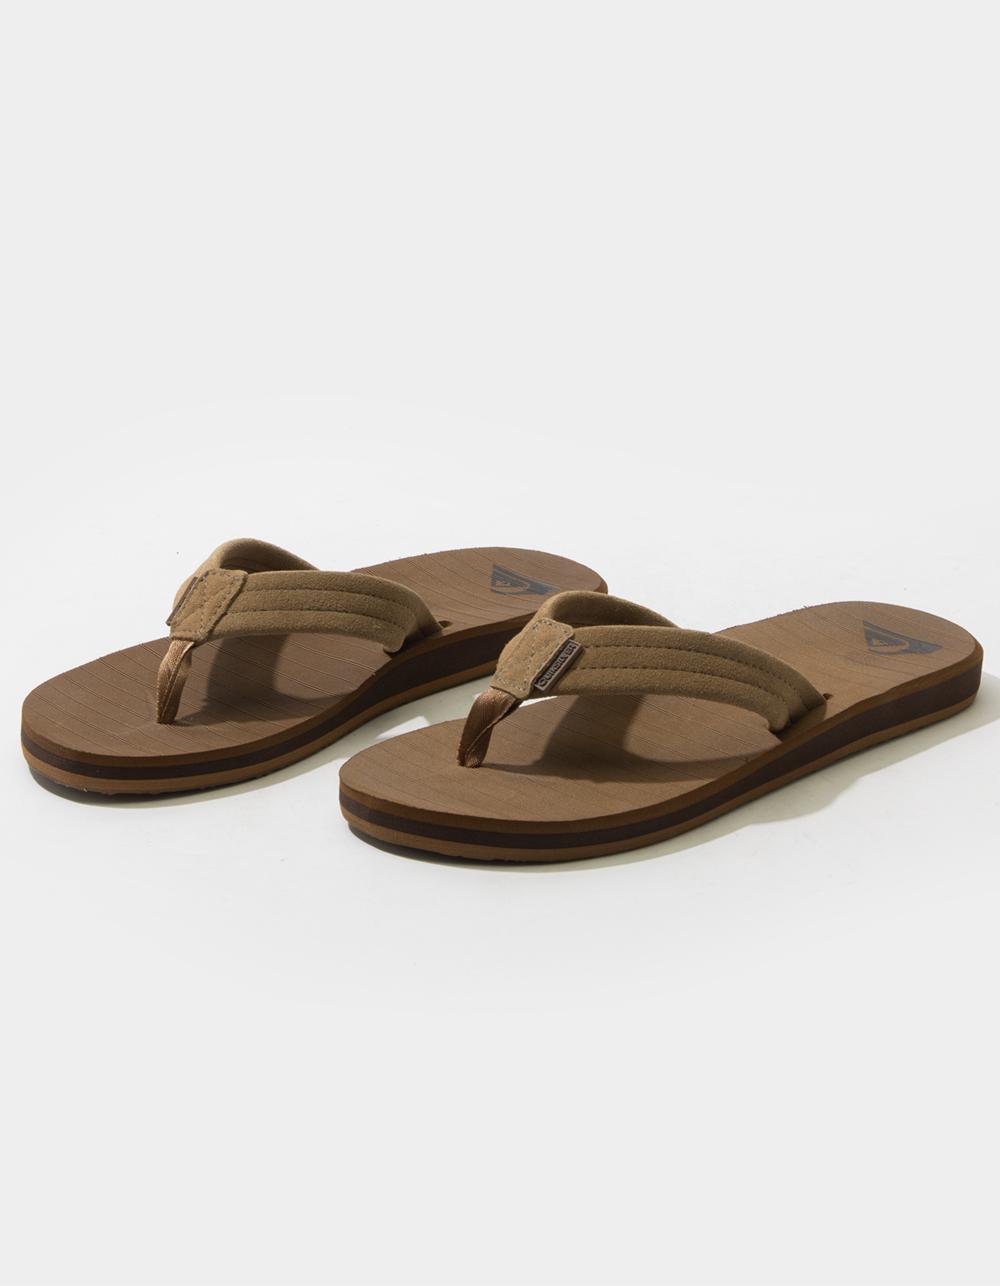 QUIKSILVER Carver Suede Sandals